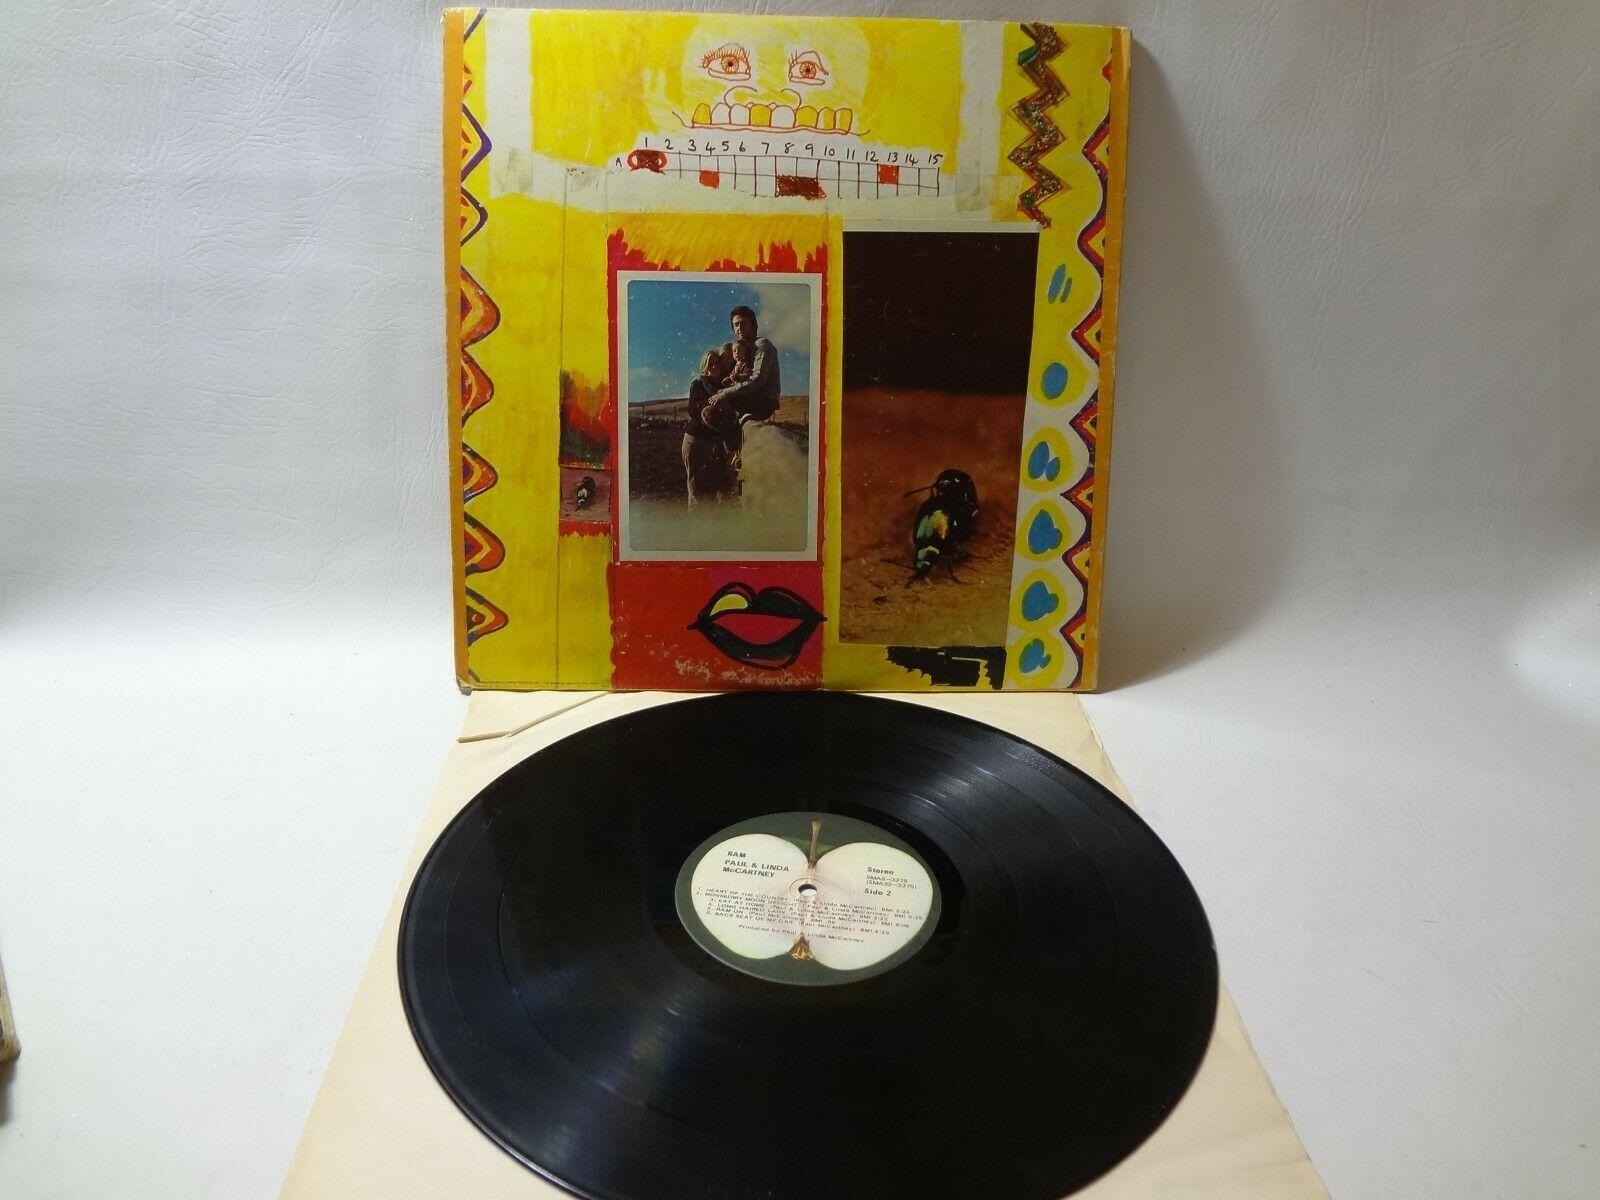 Paul And Linda McCartney- Ram SMAS-3375 1971 Pop Rock 33rpm LP Apple Record